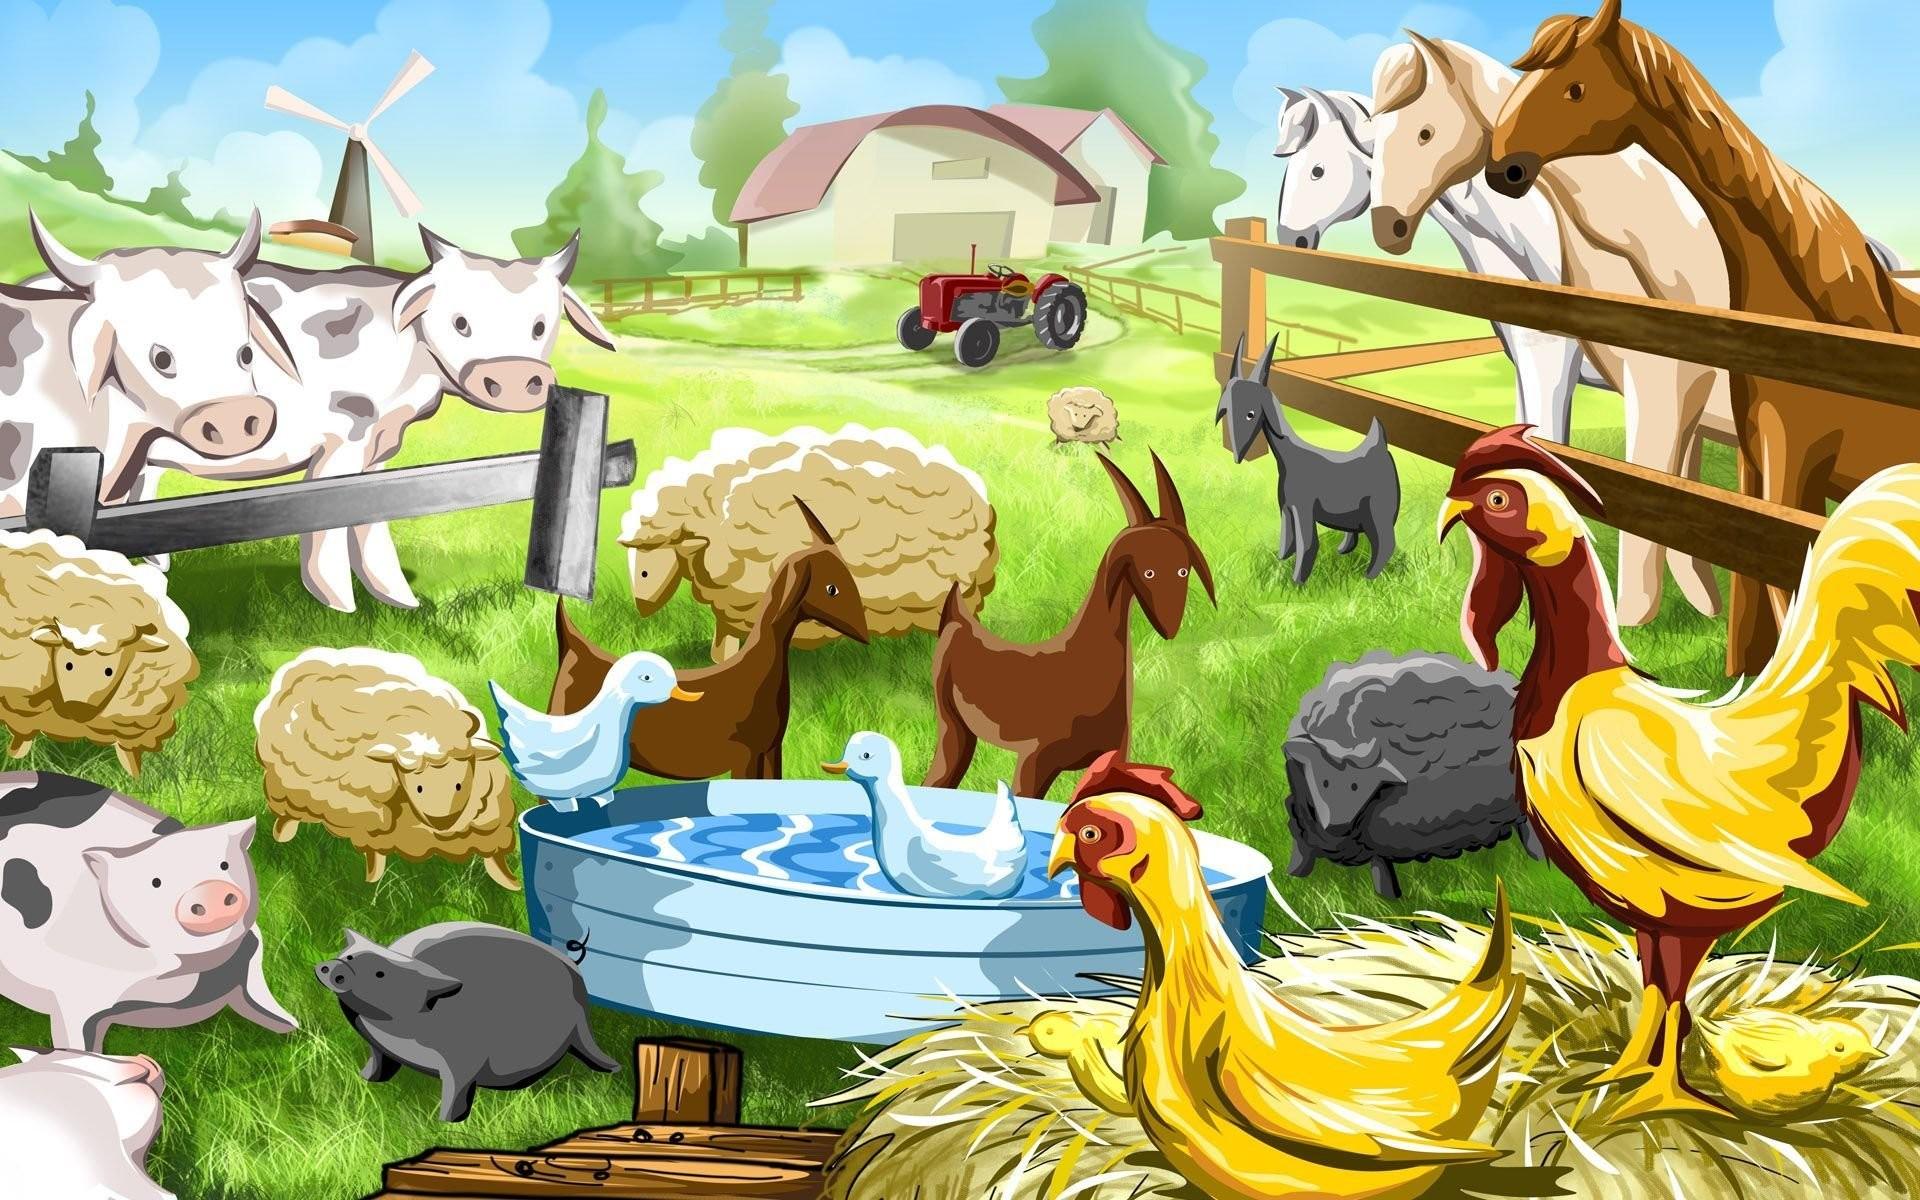 Cute Child Wallpaper For Mobile Farm Animals Wallpaper 183 ① Wallpapertag